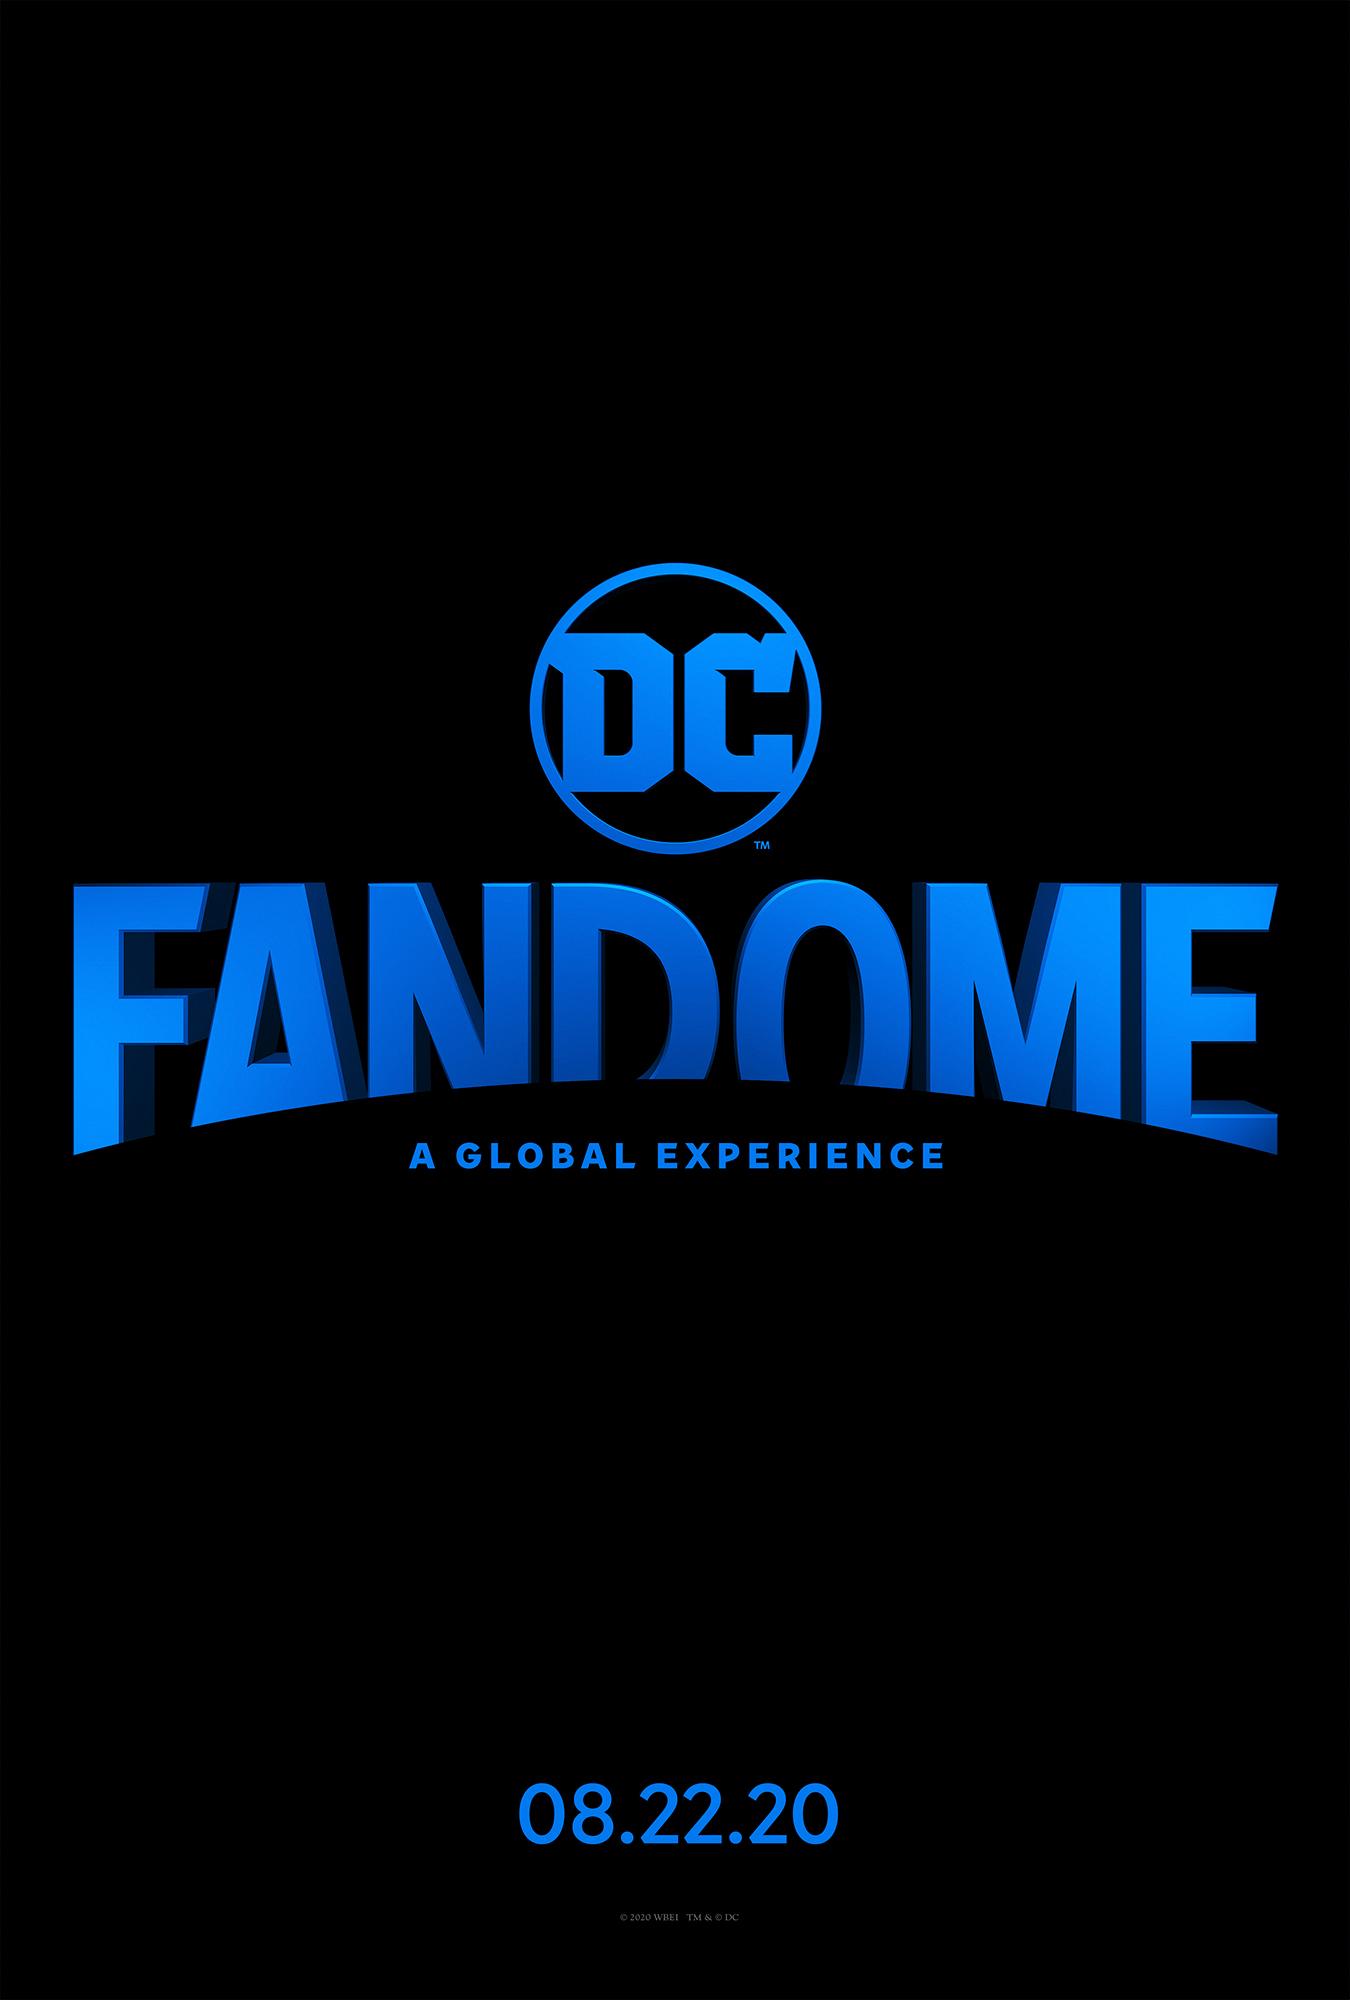 DC Fandom key art